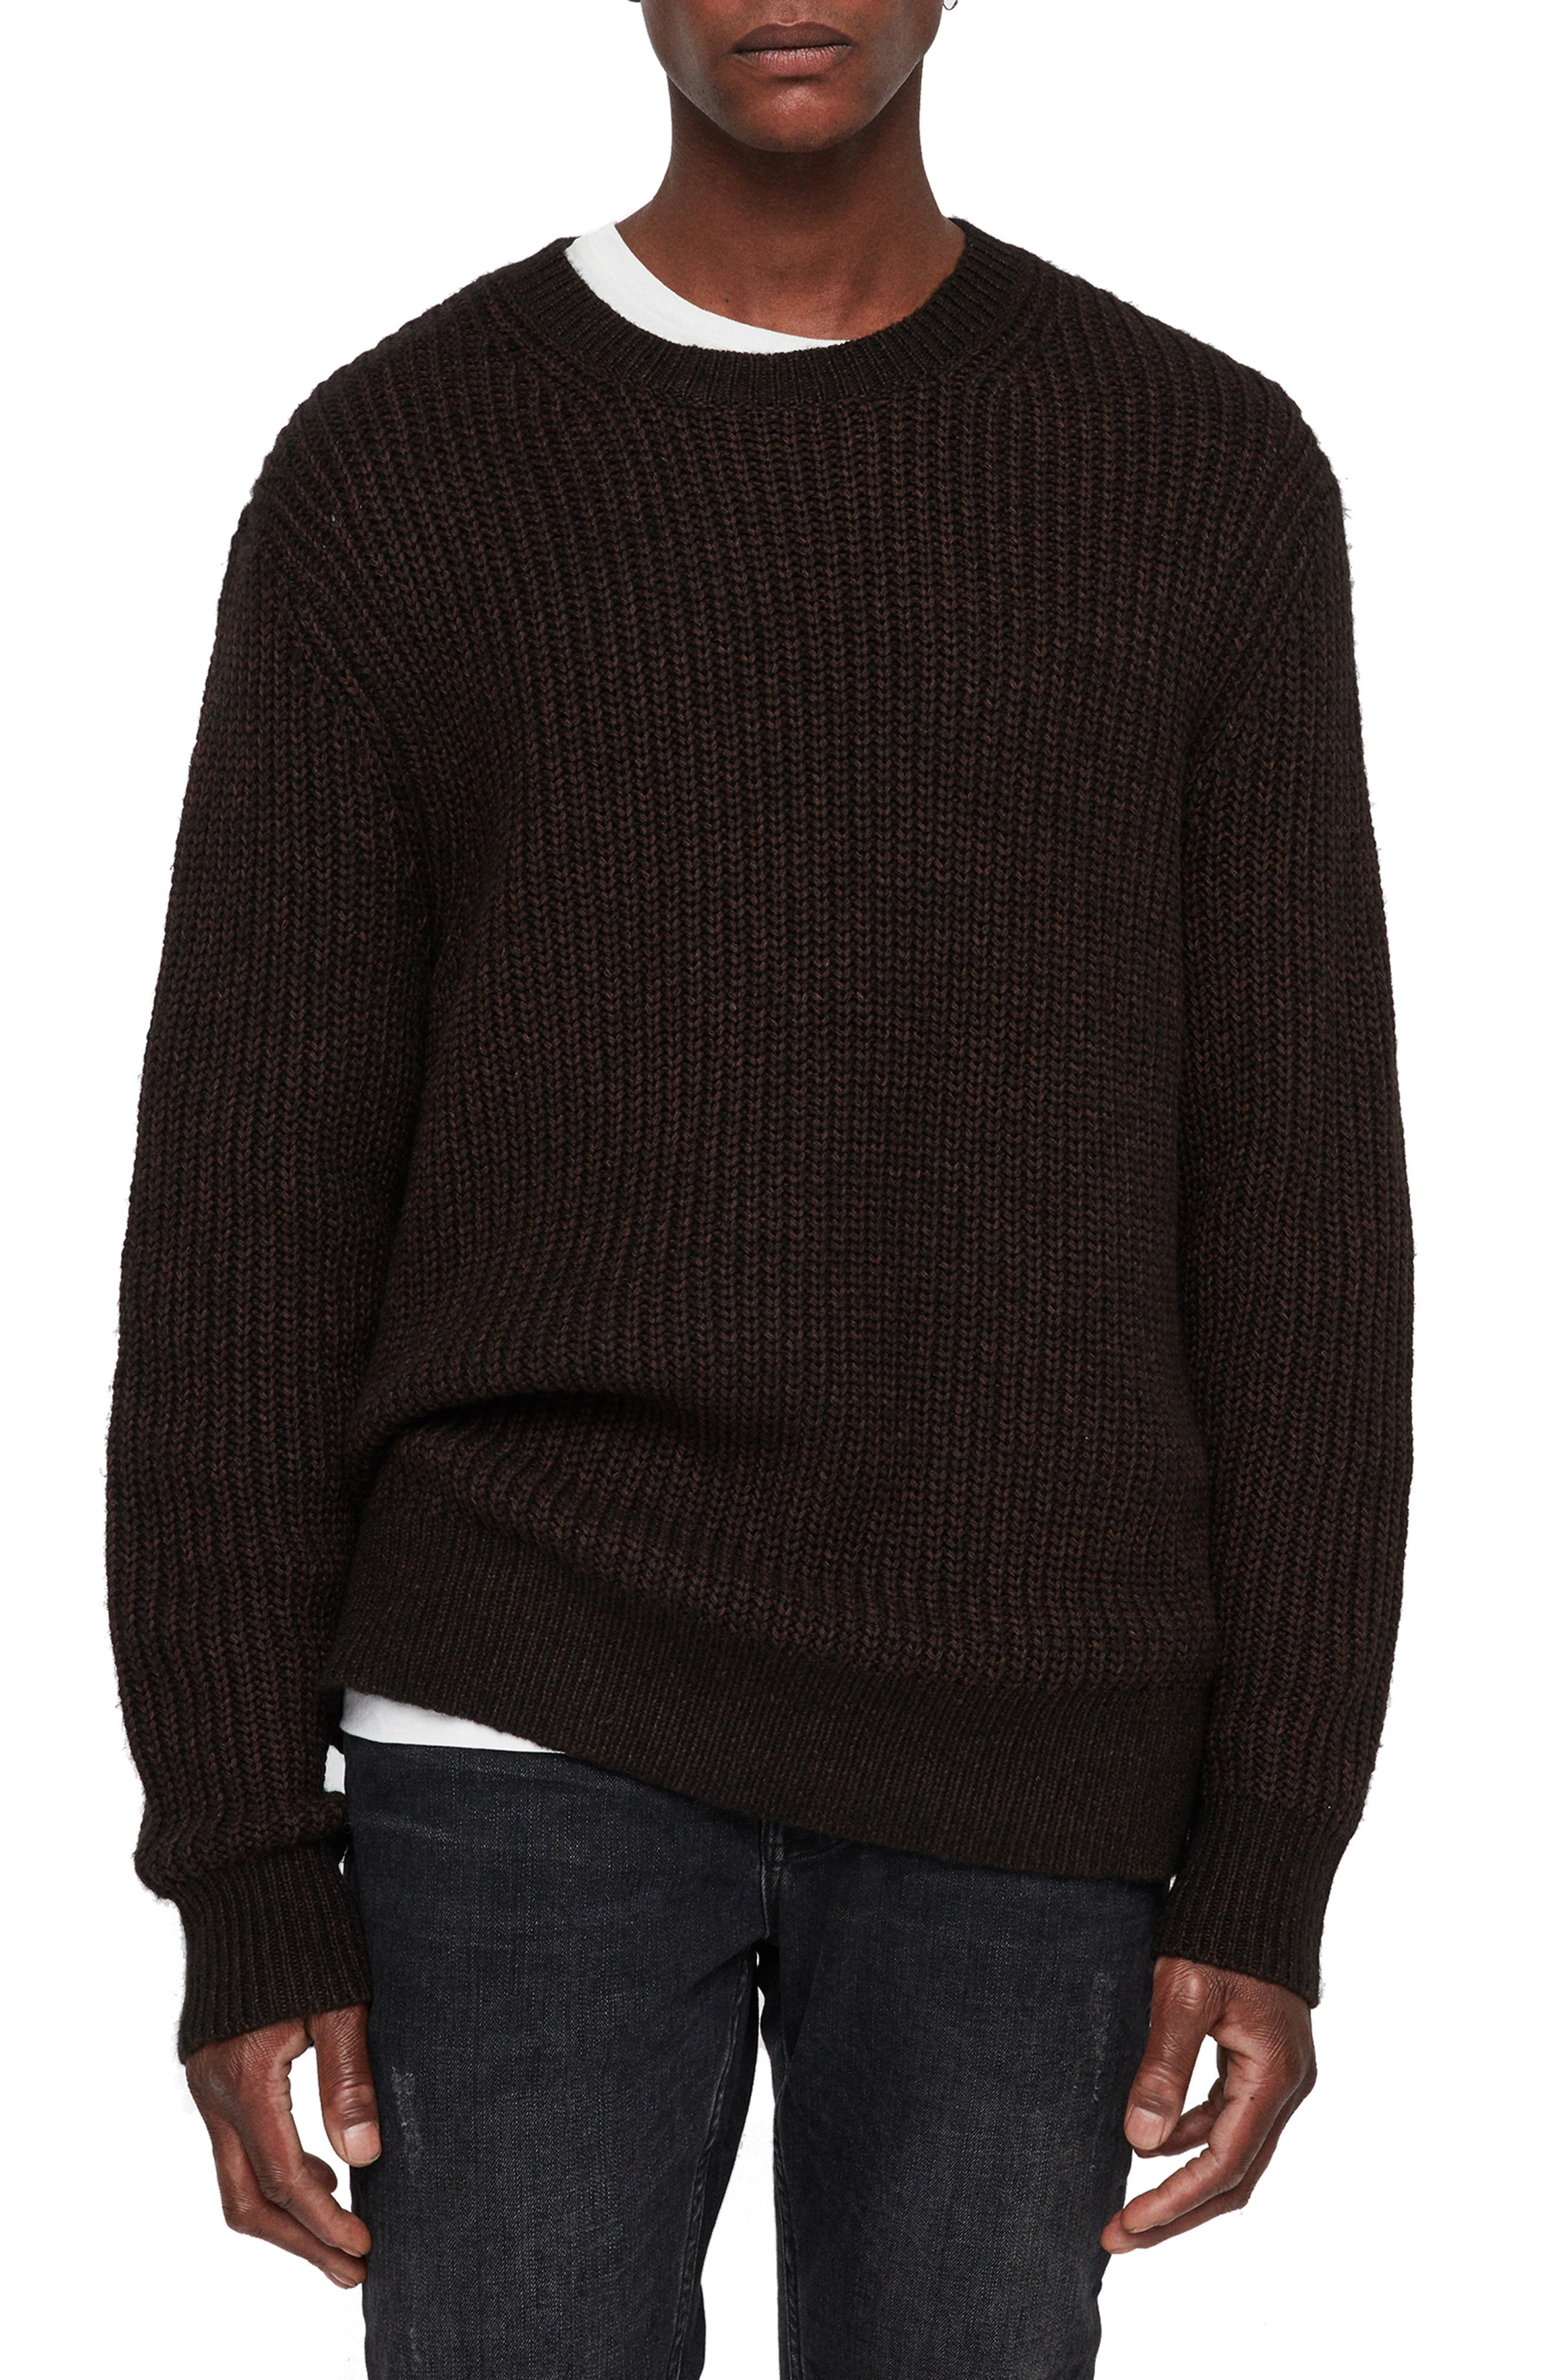 Tilman Regular Fit Sweater,                             Main thumbnail 1, color,                             001